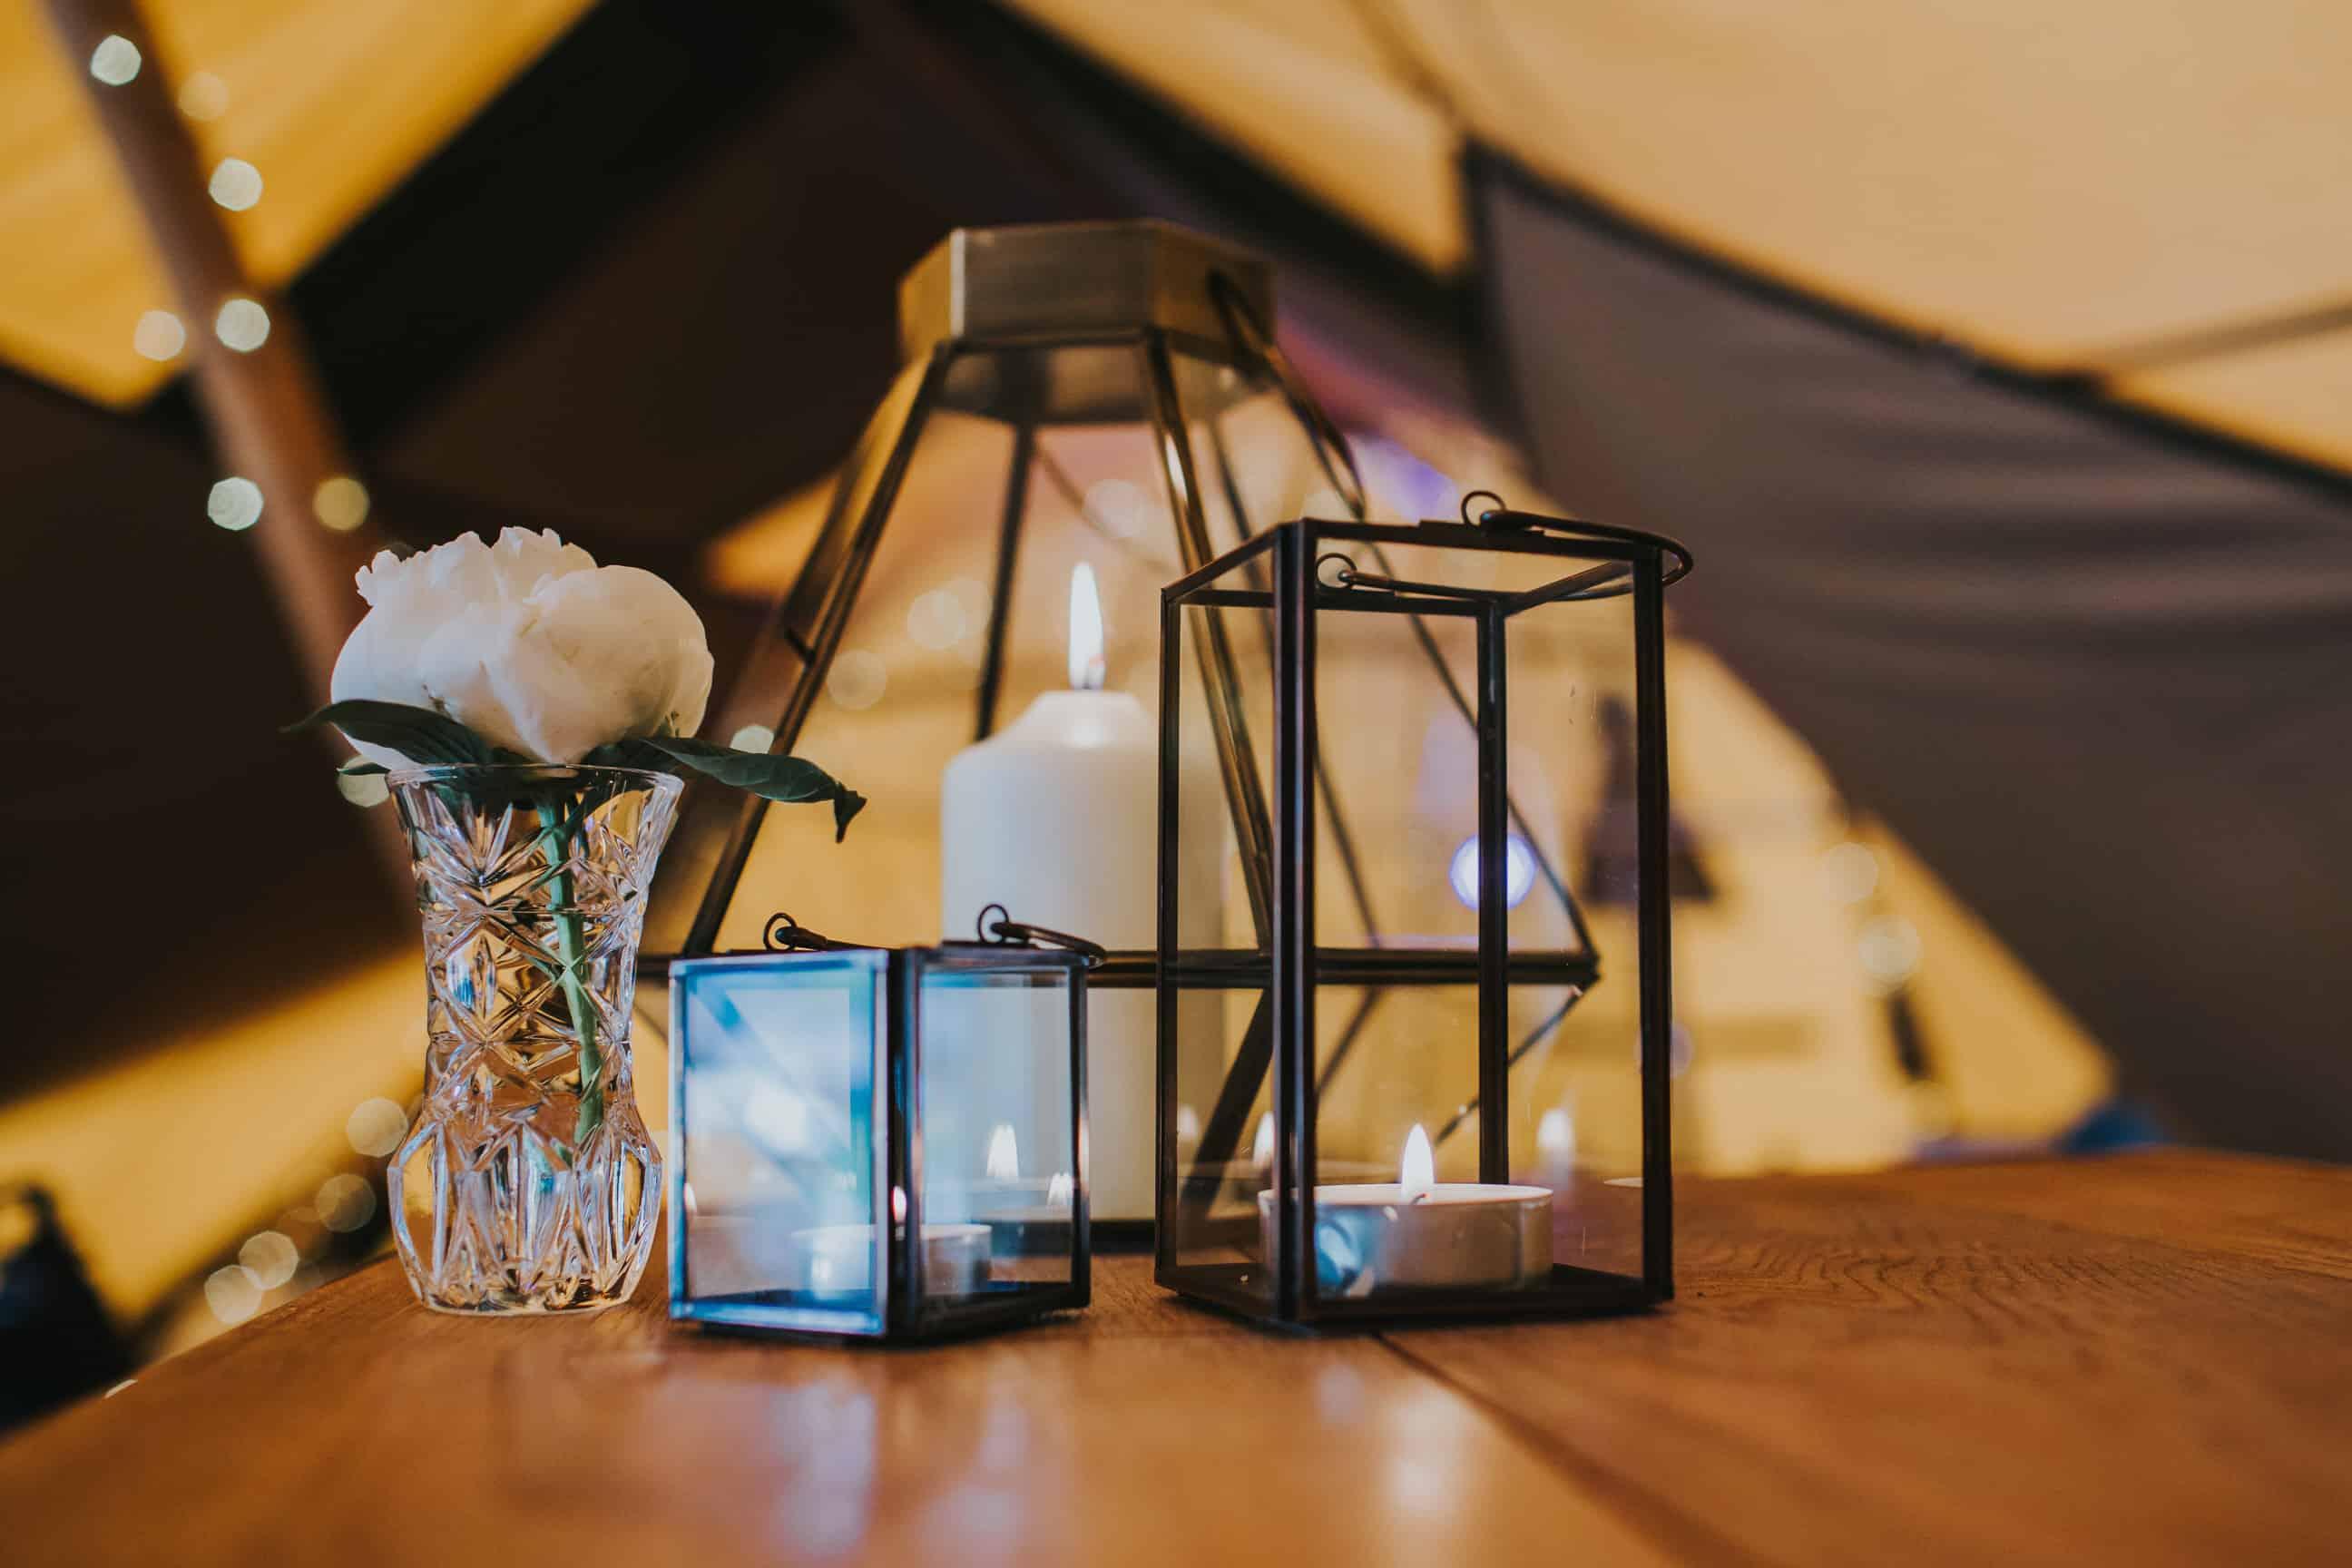 lanterns - Sami Tipi Spring Showcase captured by Ed Brown Photography